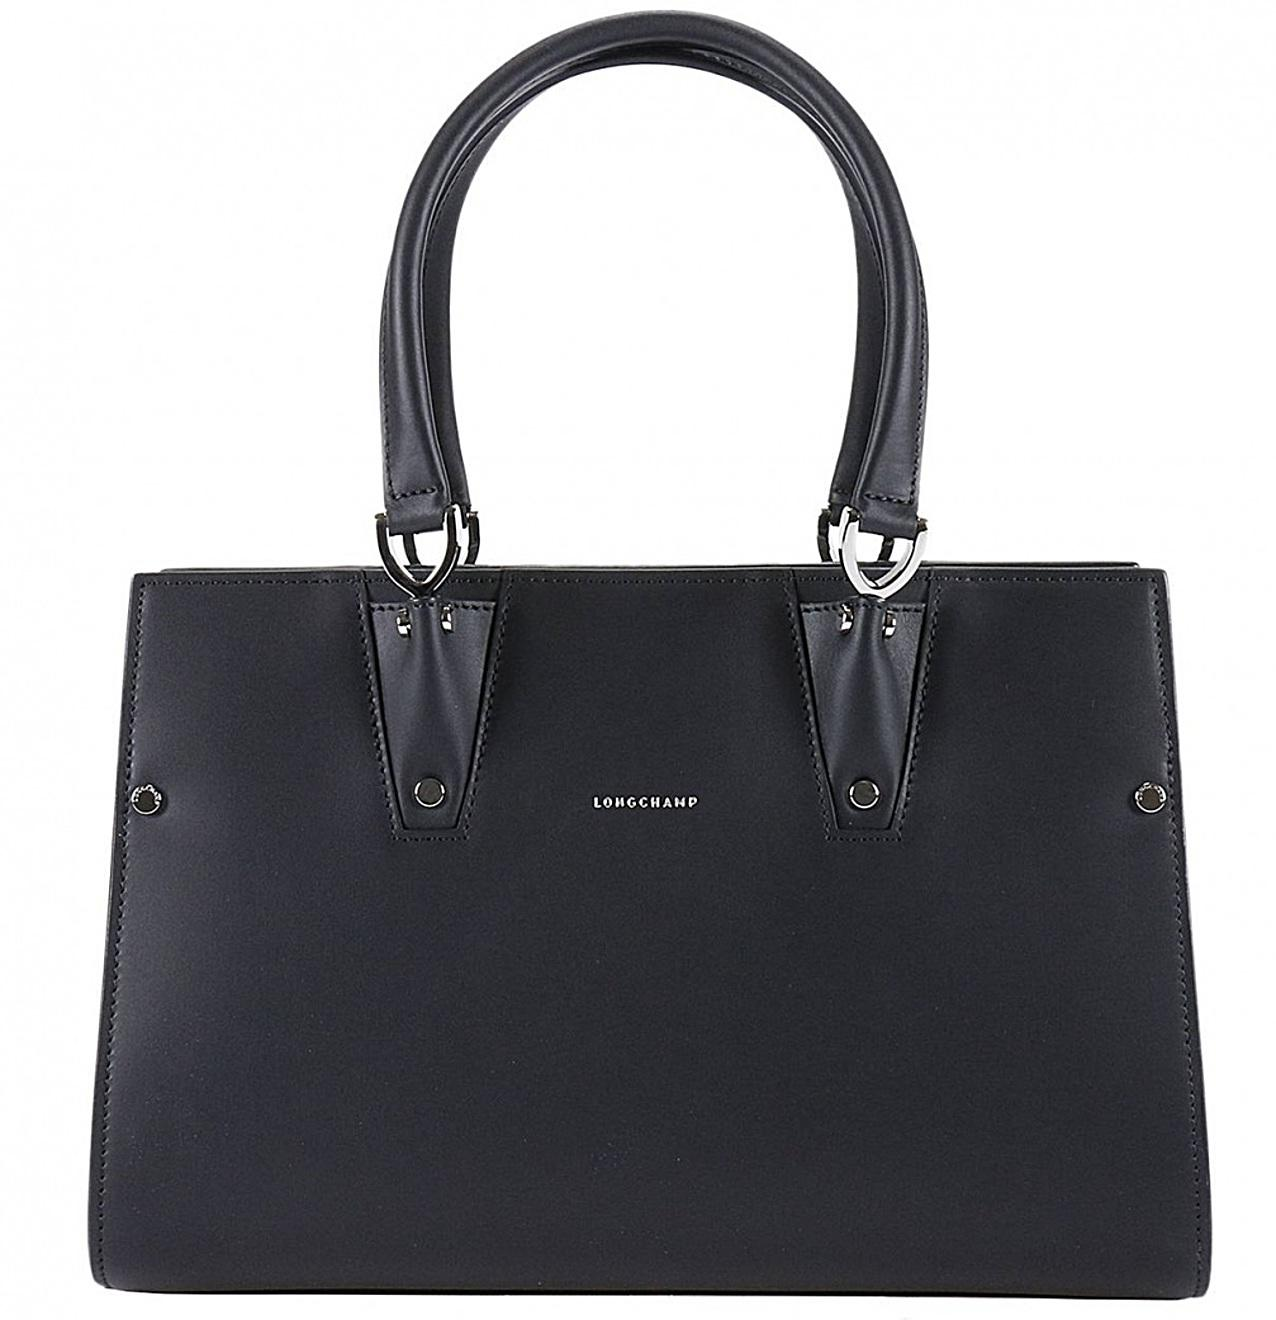 332b15952 Longchamp Totes Uk. Lyst - Longchamp Tote in Black Le Pliage Longchamp  Womens Tote bag ...